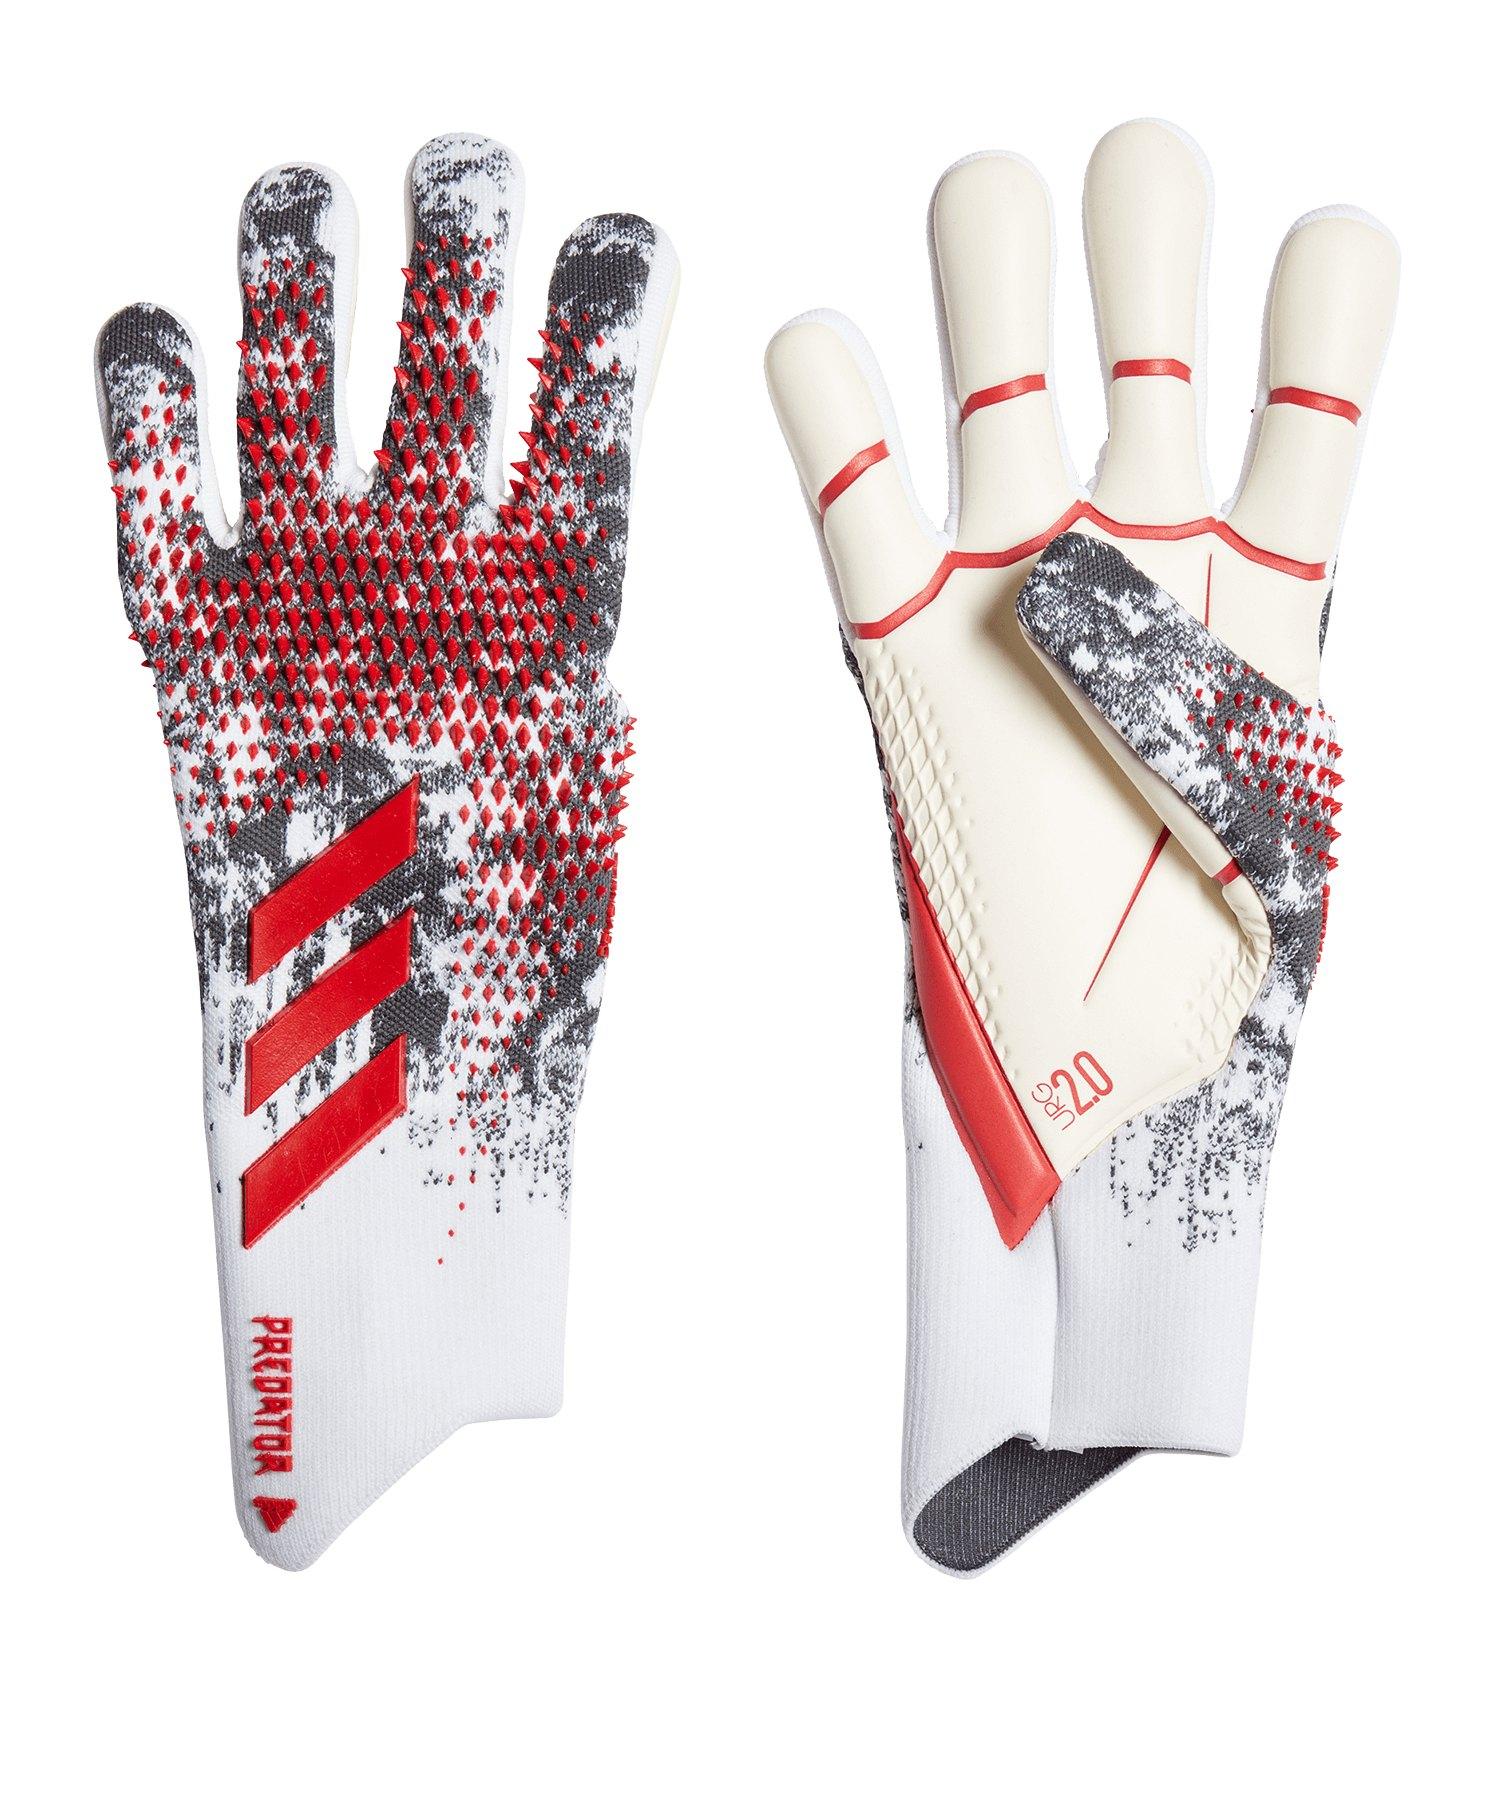 adidas Predator Pro Neuer TW-Handschuh Weiss Rot - weiss